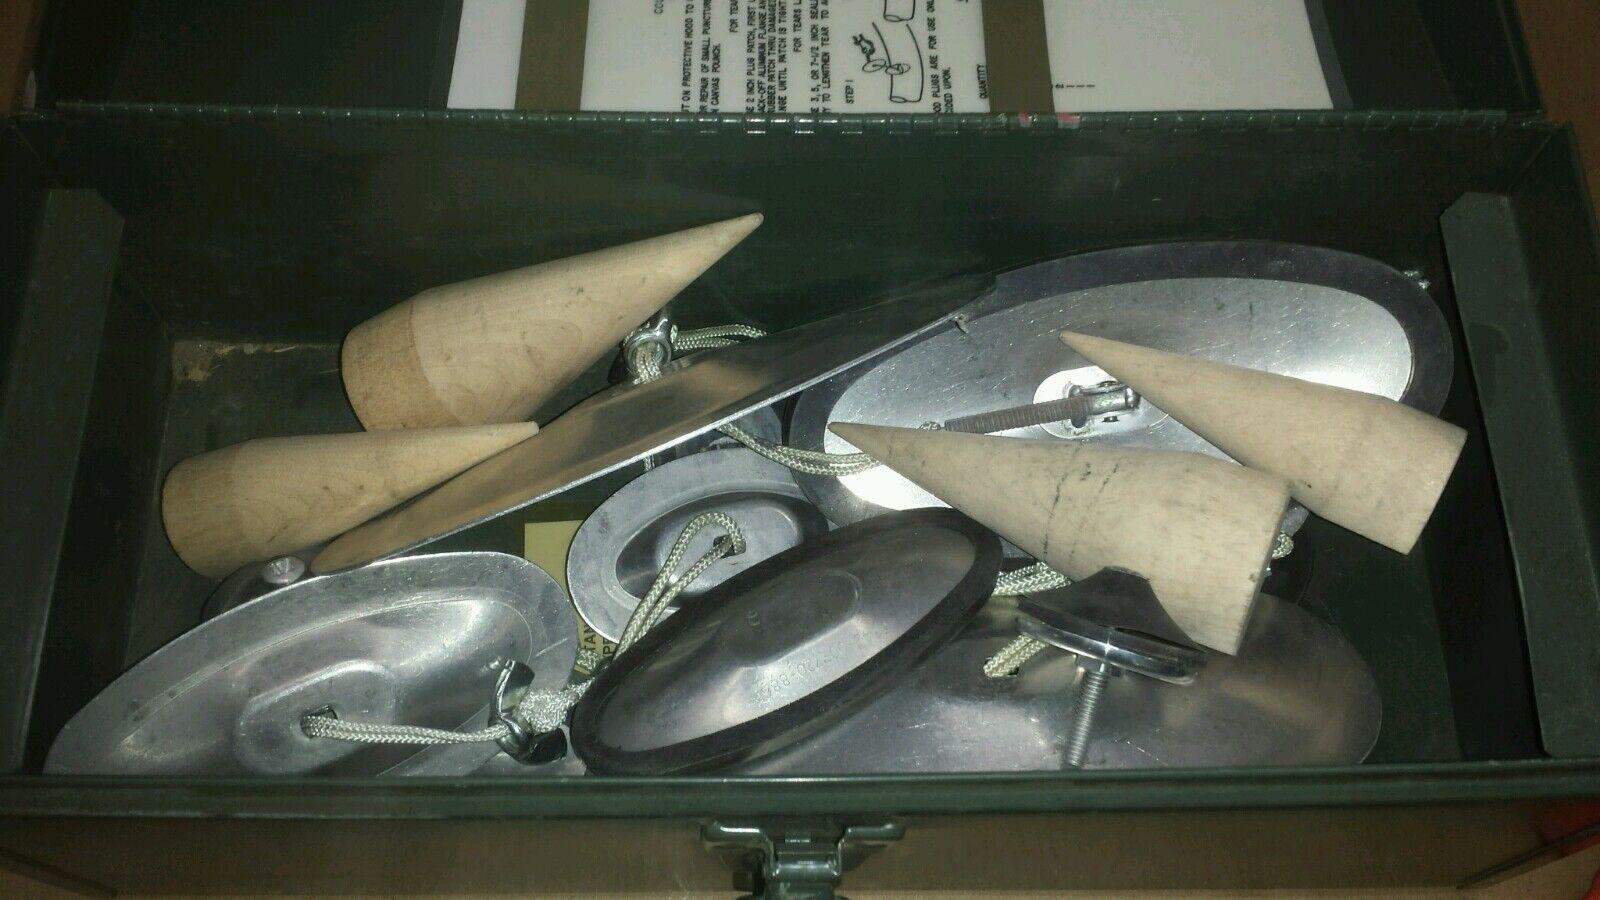 Dresser-agus 6246 Plegable Tambor Tela Tanque Kit De Reparación